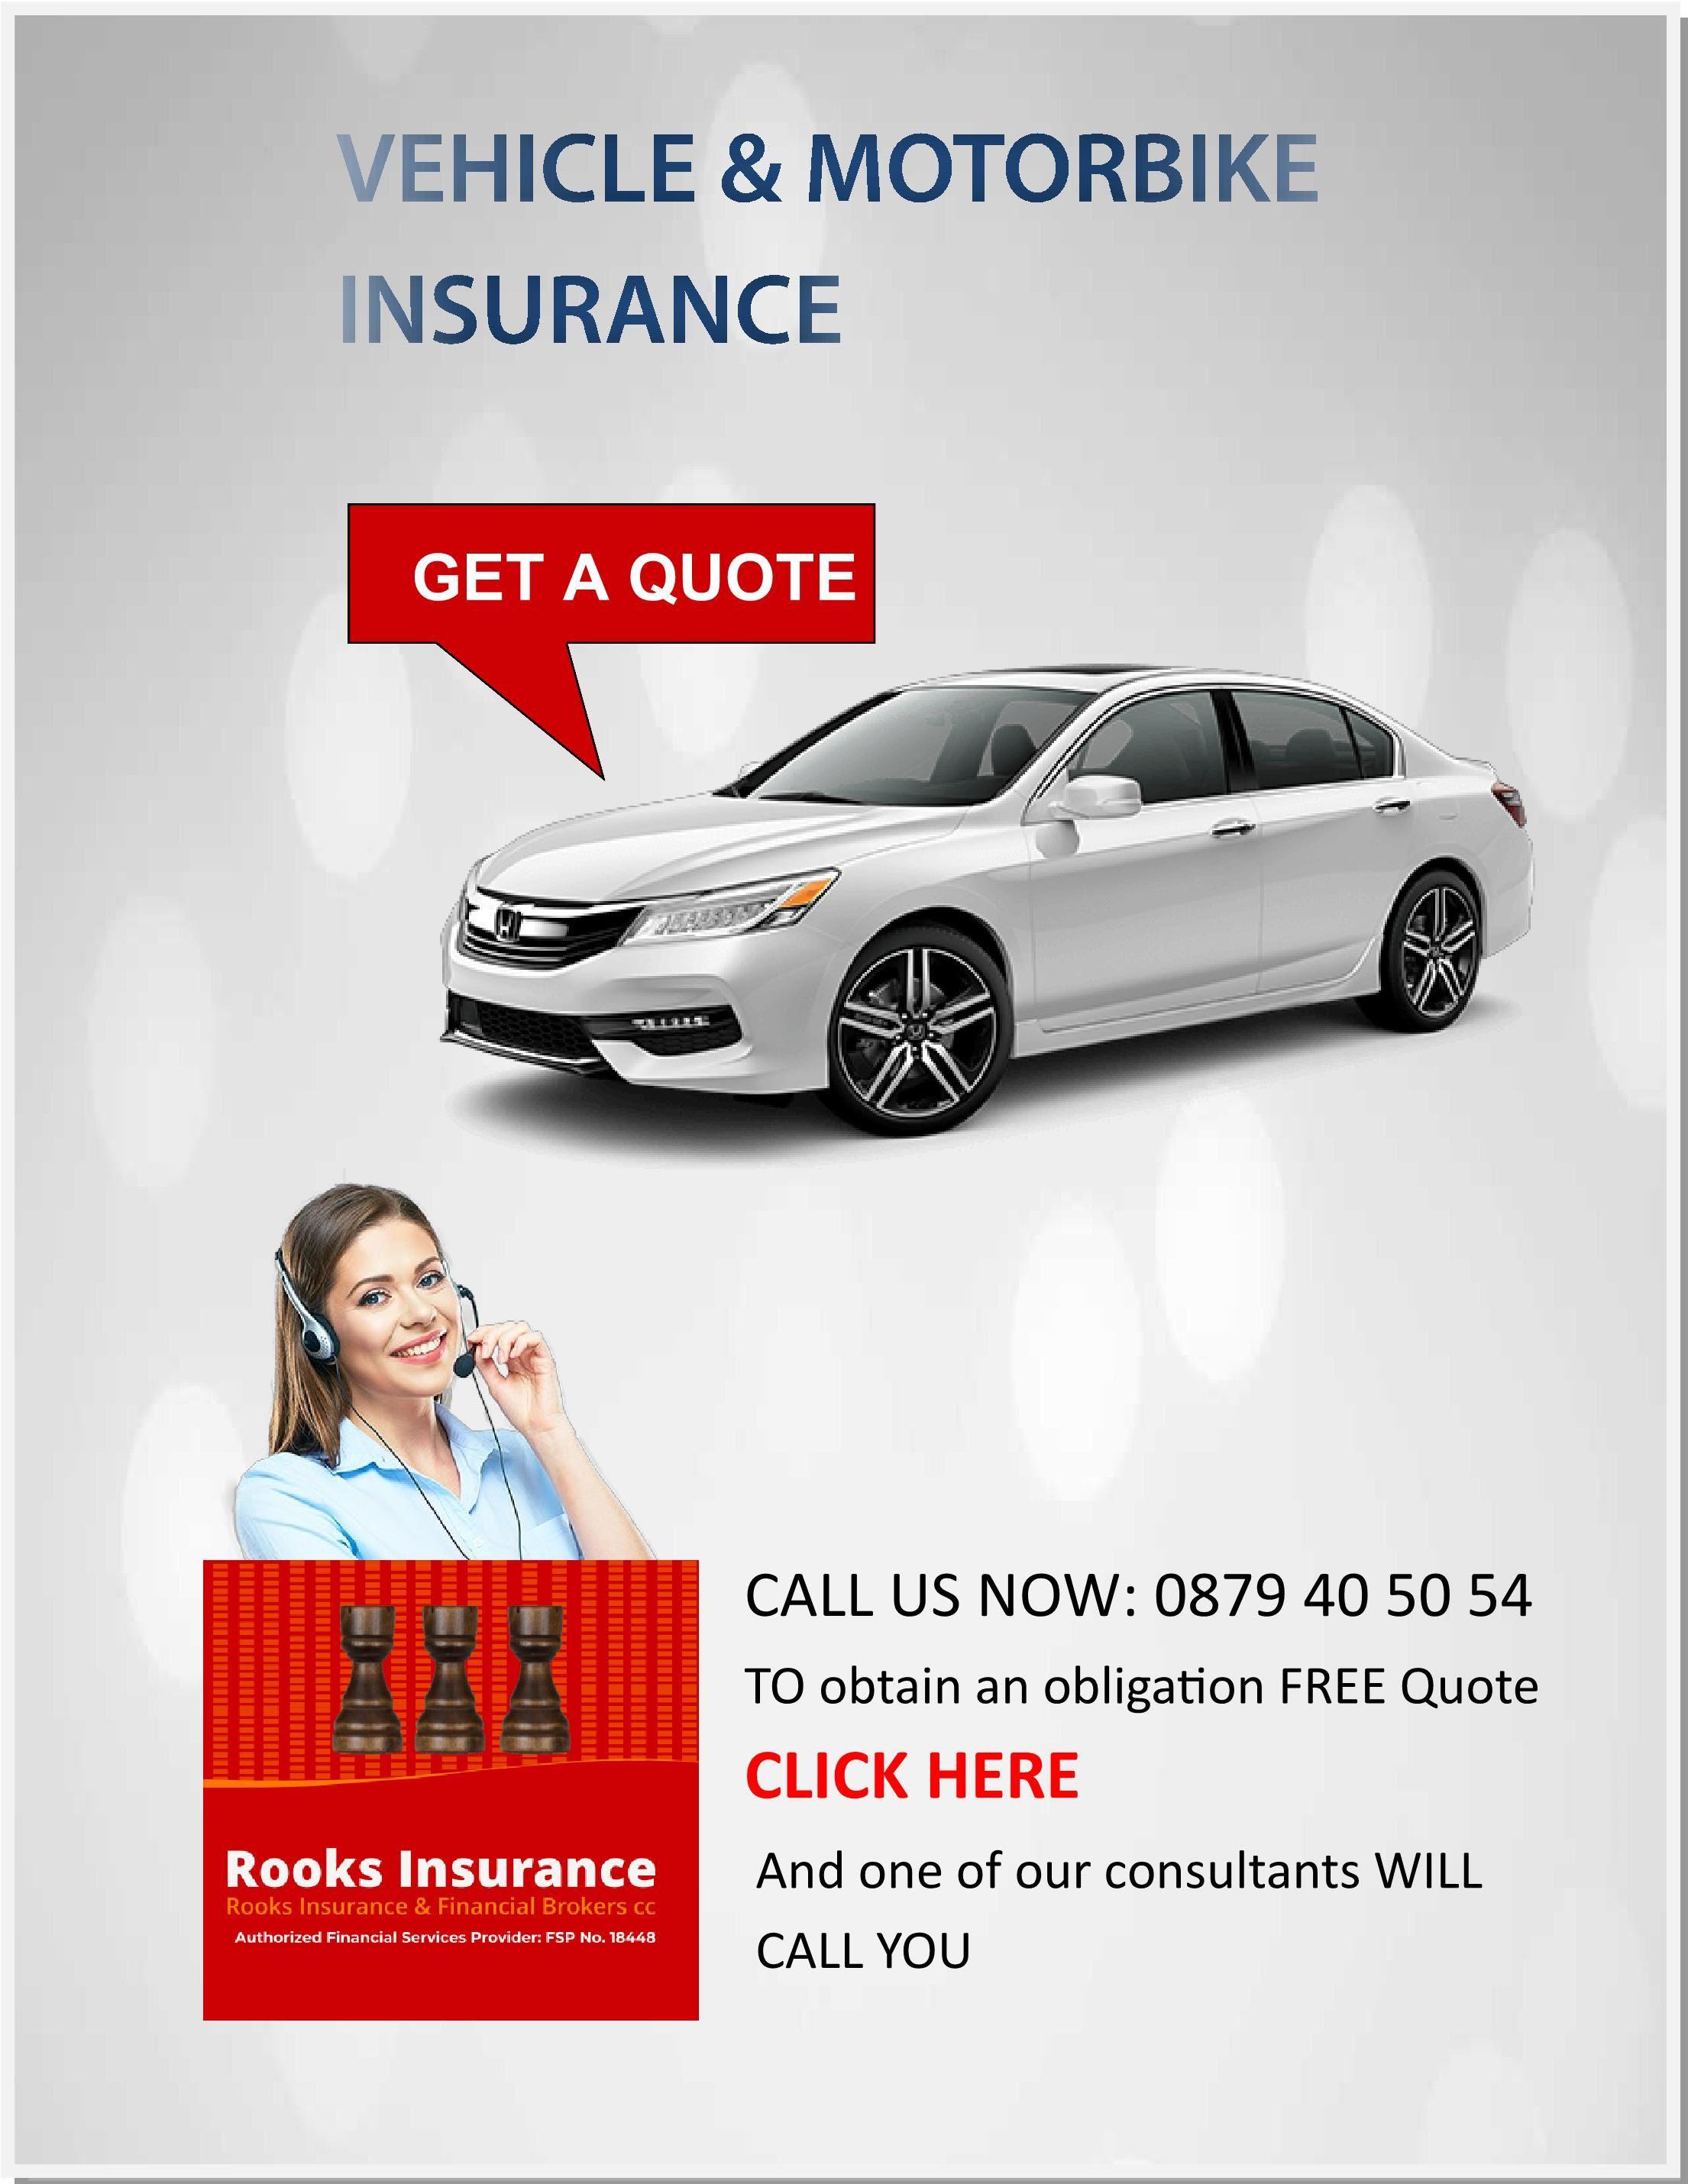 Car Insurance Advertisement - Cars Models